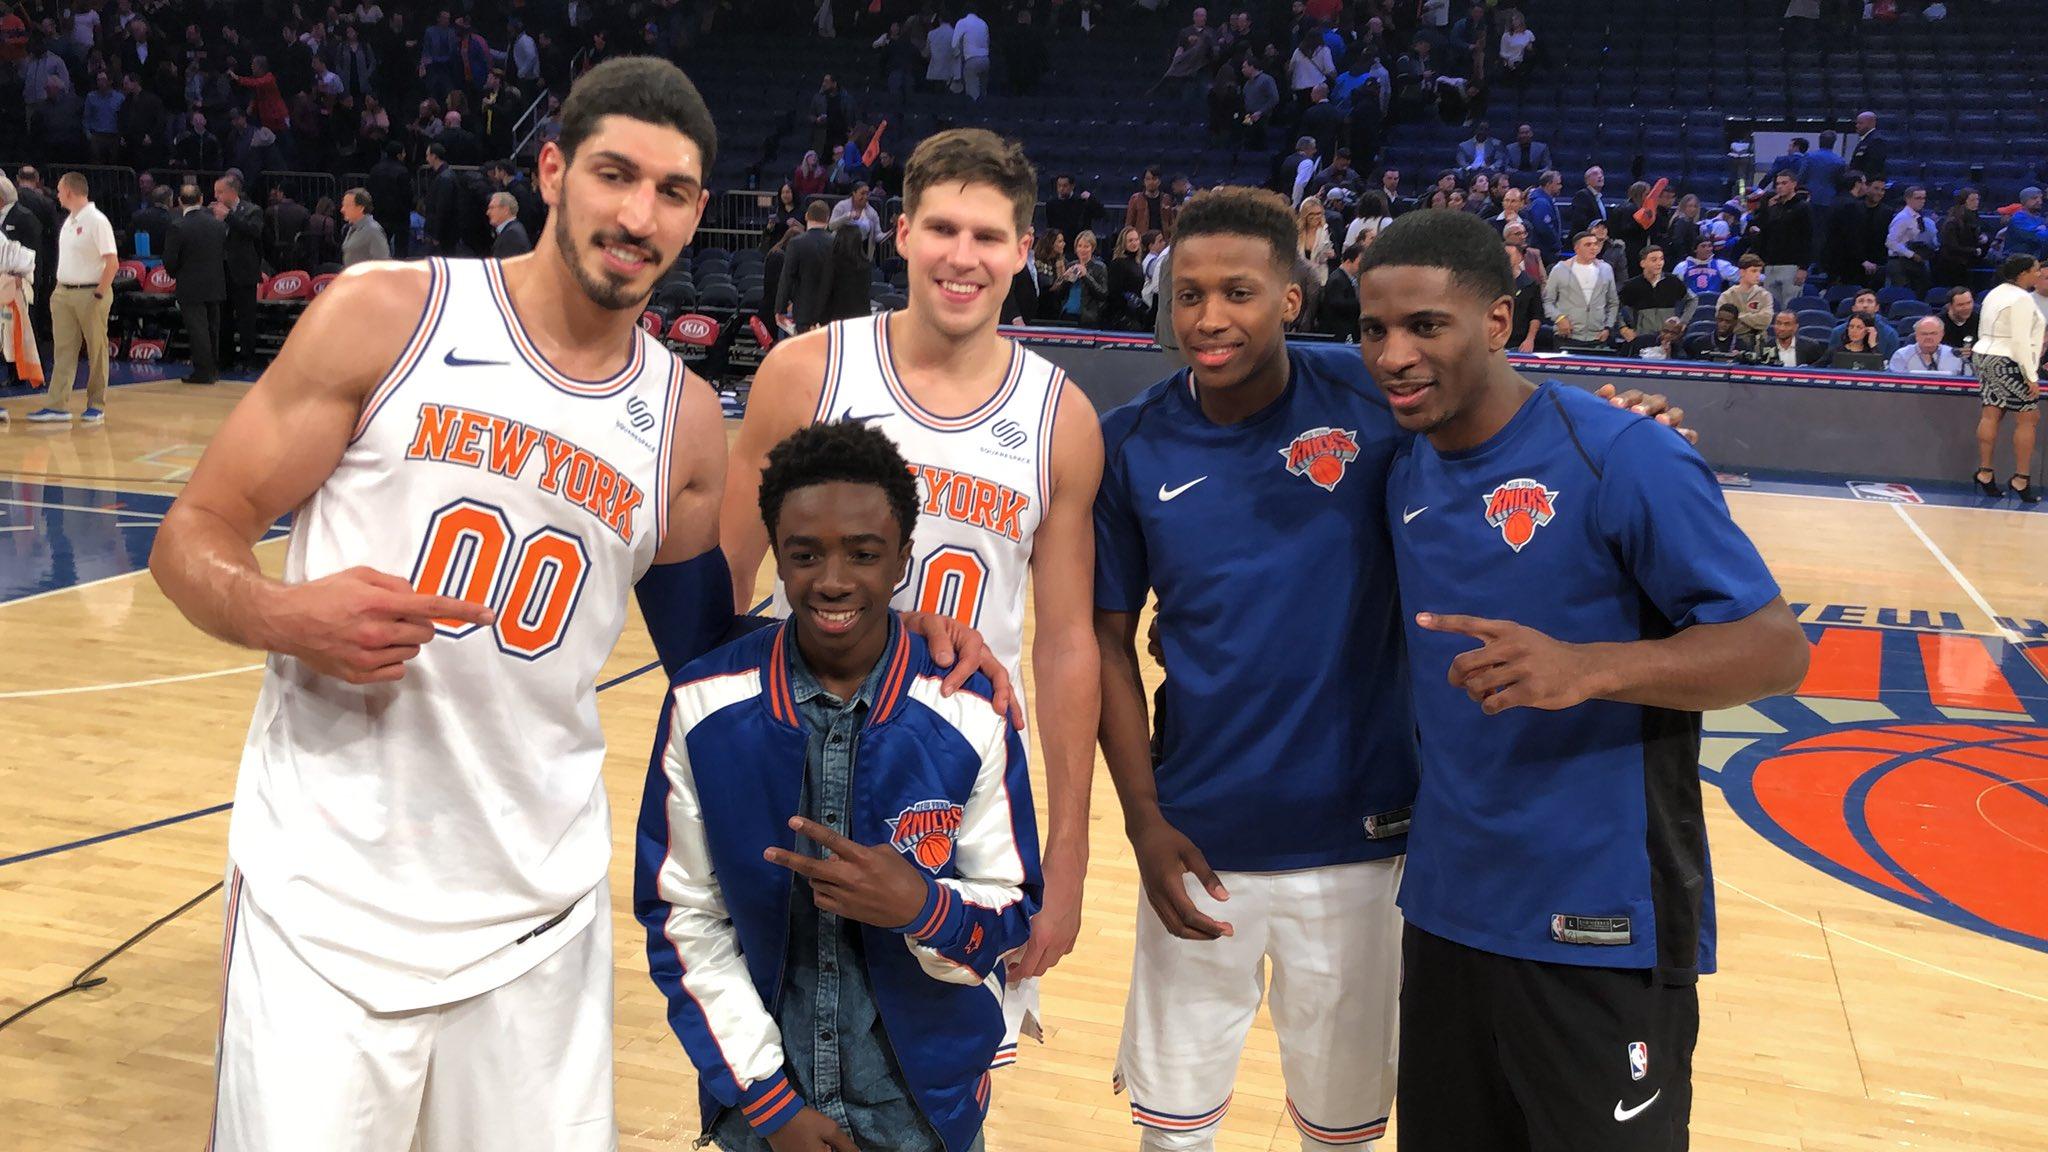 #Knicks x @calebmclaughlin! https://t.co/Wwf1ZBoog7